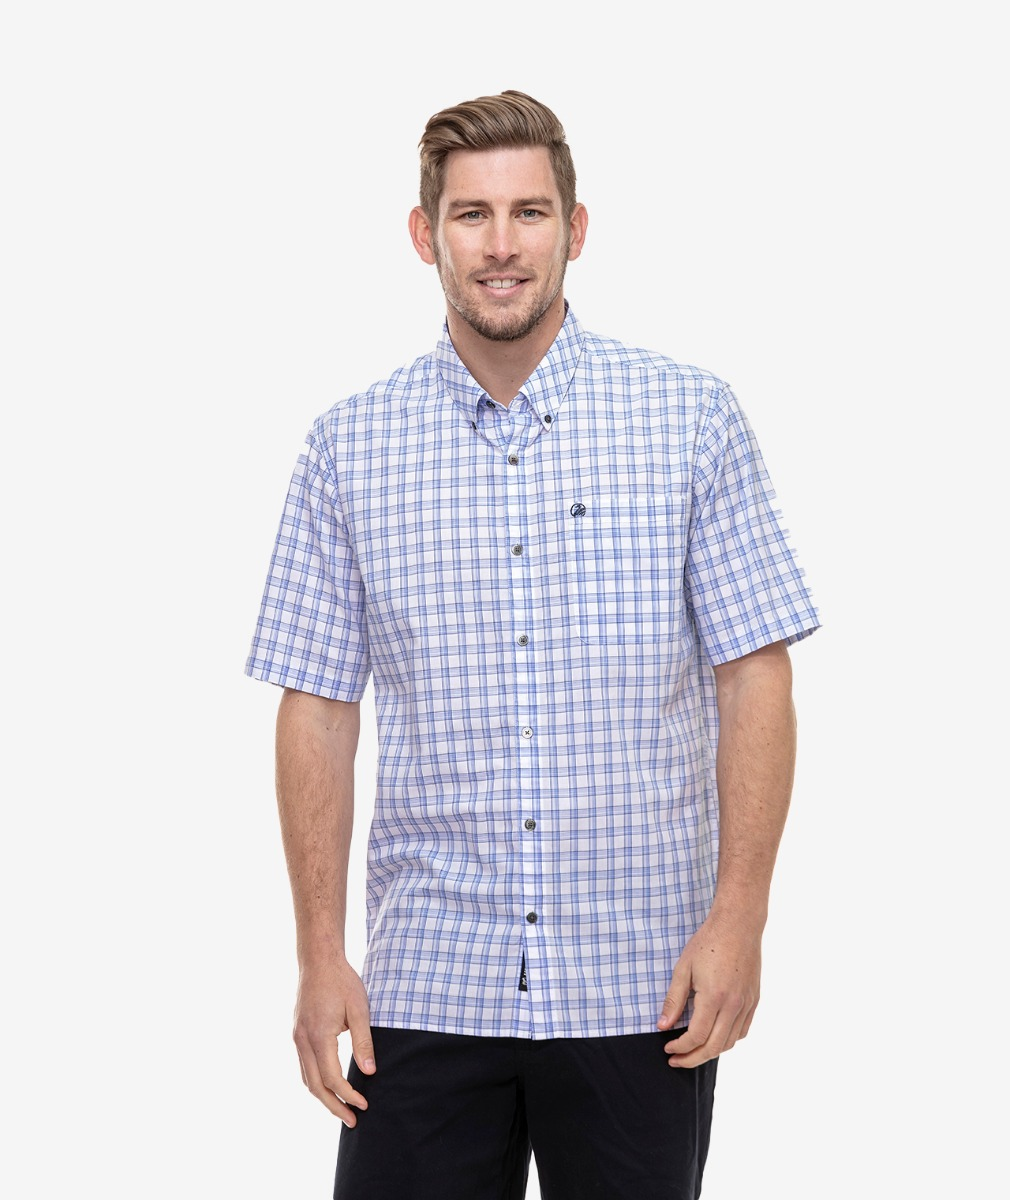 Swanndri Men's Evanston Cotton Shirt Sleeve Shirt